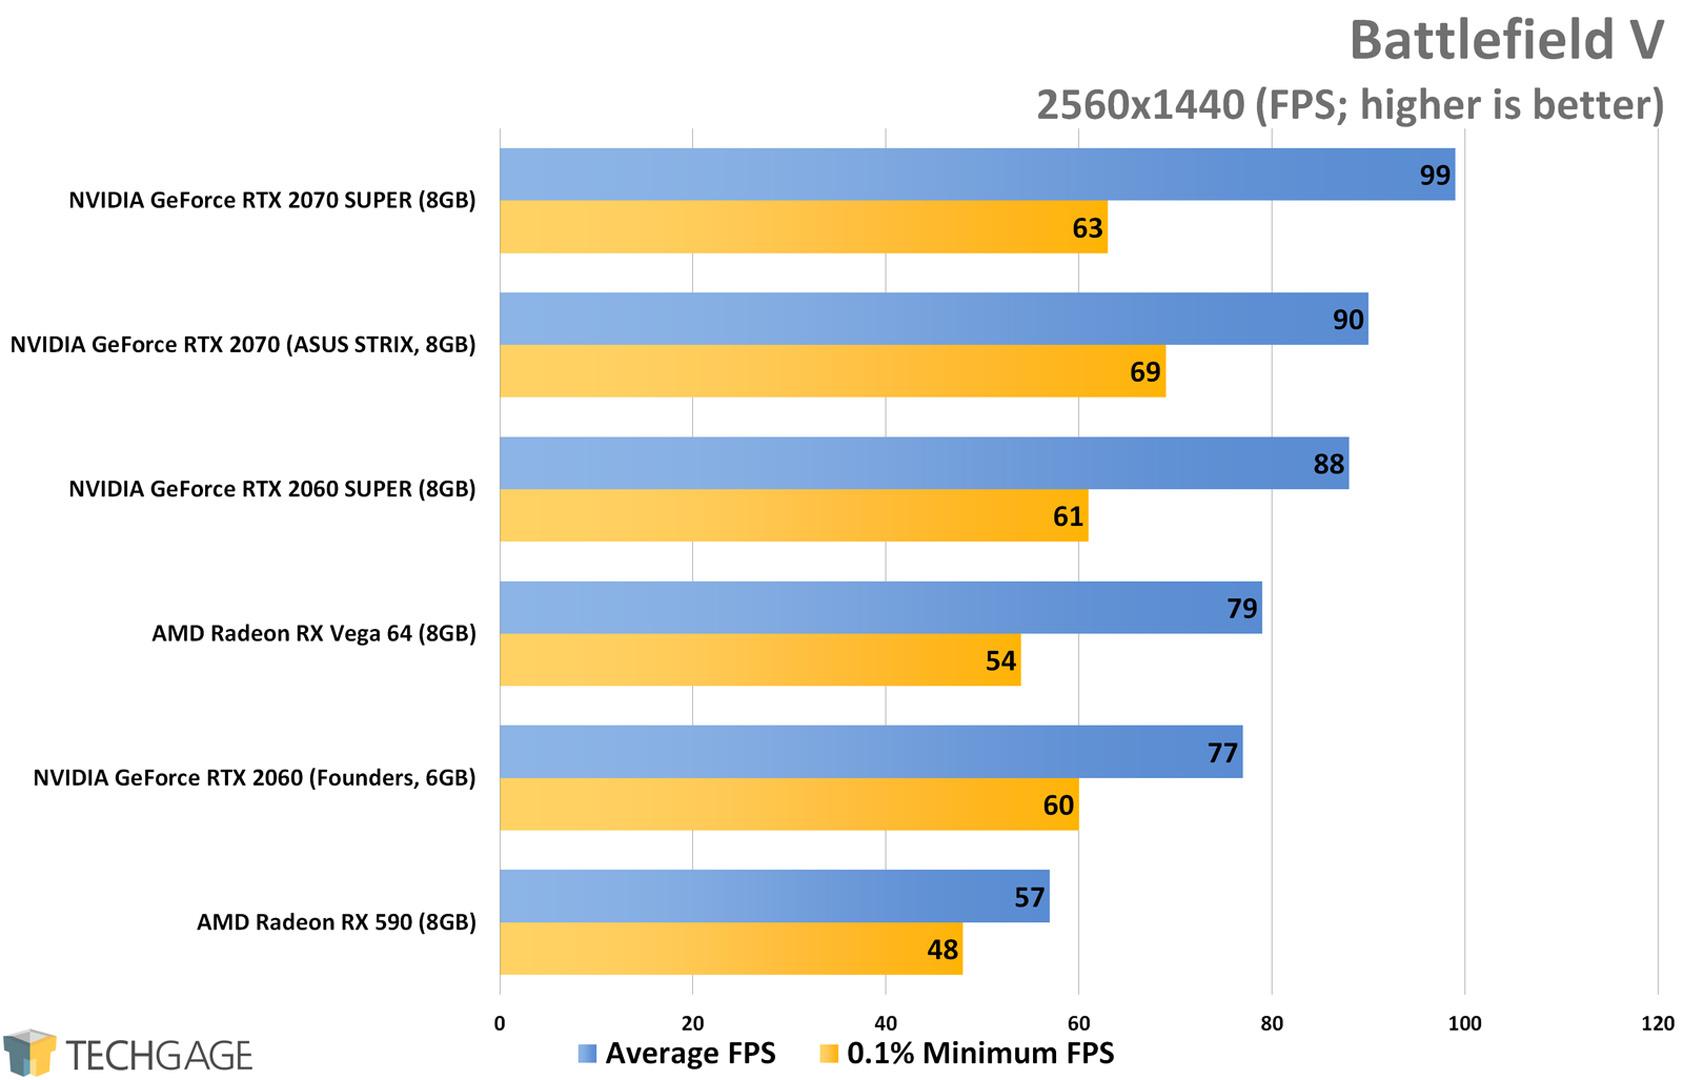 Battlefield V (1440p) - NVIDIA RTX SUPER 2060 and 2070 Performance